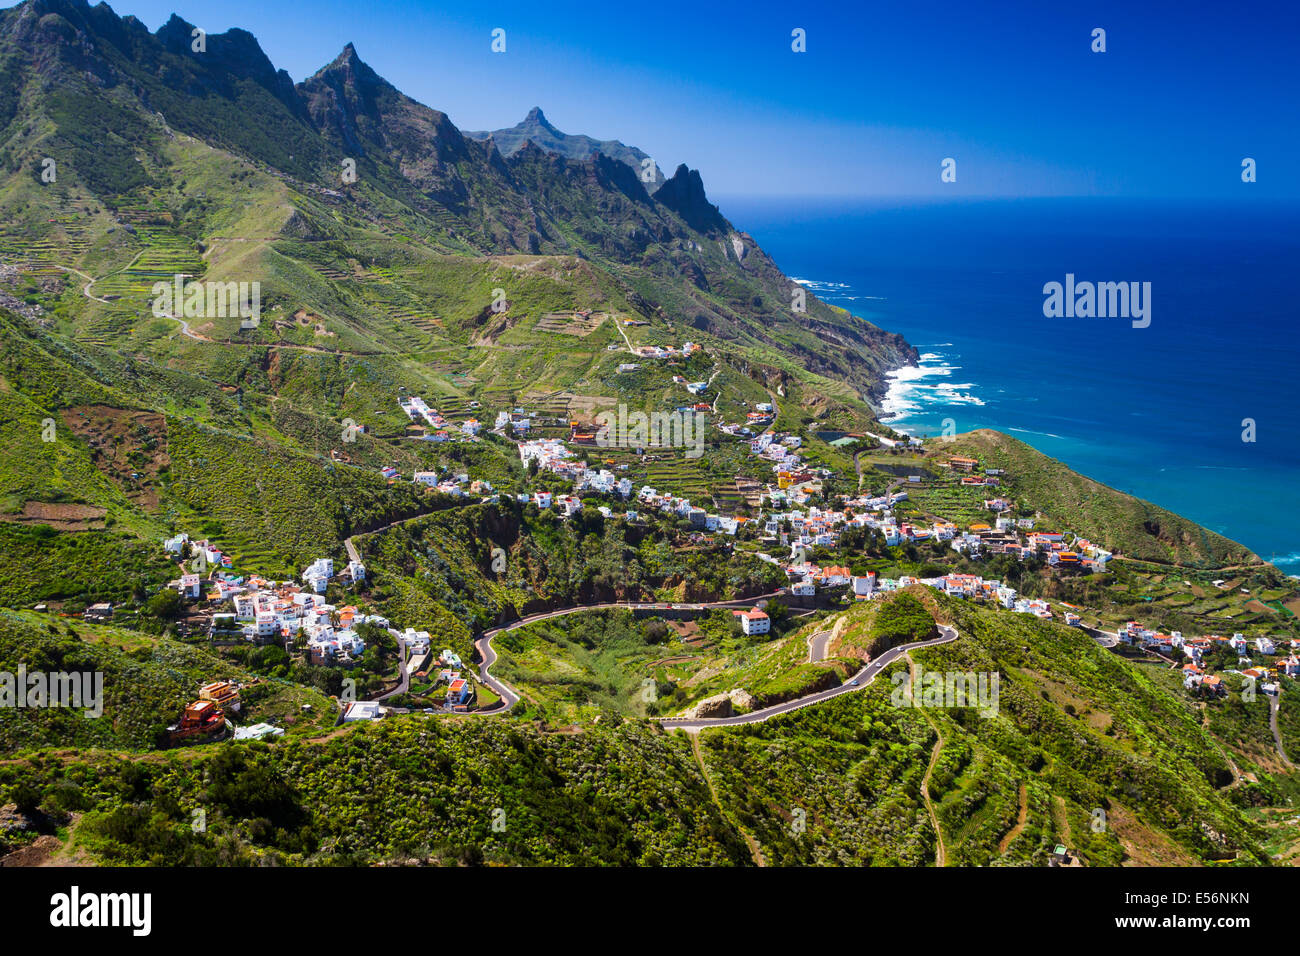 Taganaga village and cliffs. Santa Cruz de Tenerife, Tenerife, Canary Islands, Atlantic Ocean, Spain. Europe. - Stock Image